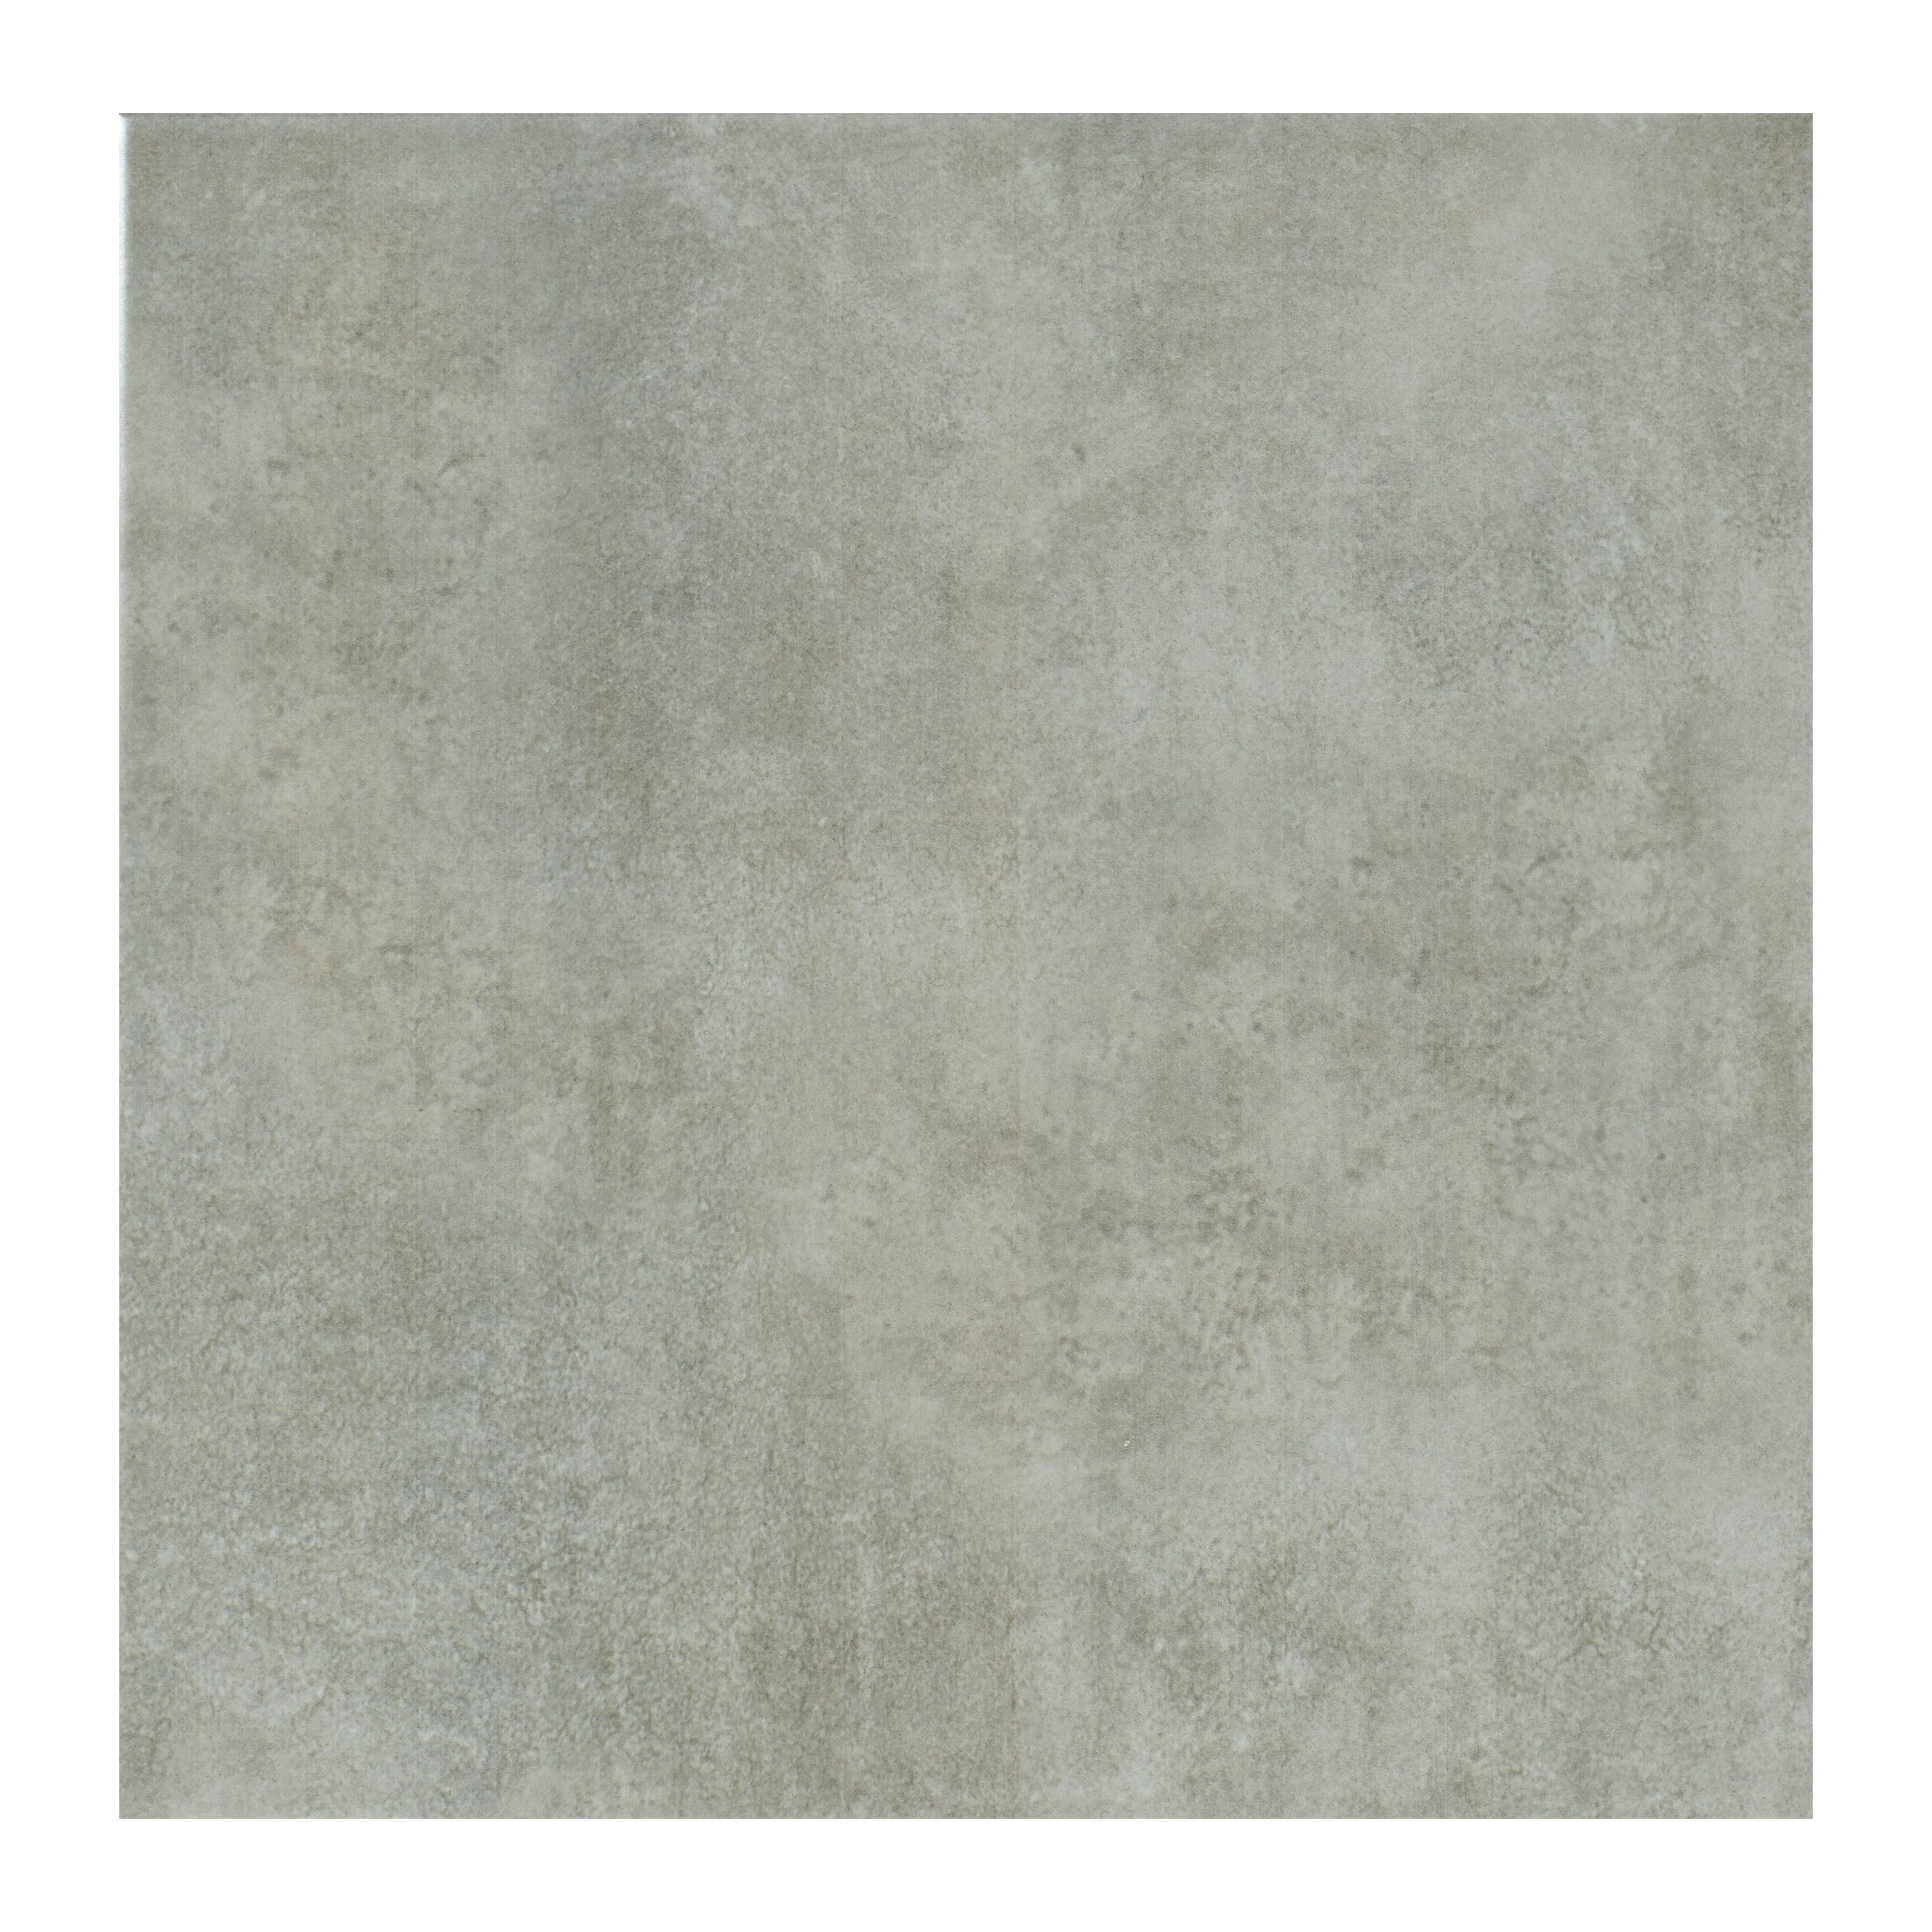 Floor mats b q - Lombardy Platinum Ceramic Floor Tile Pack Of 9 L 330mm W 330mm